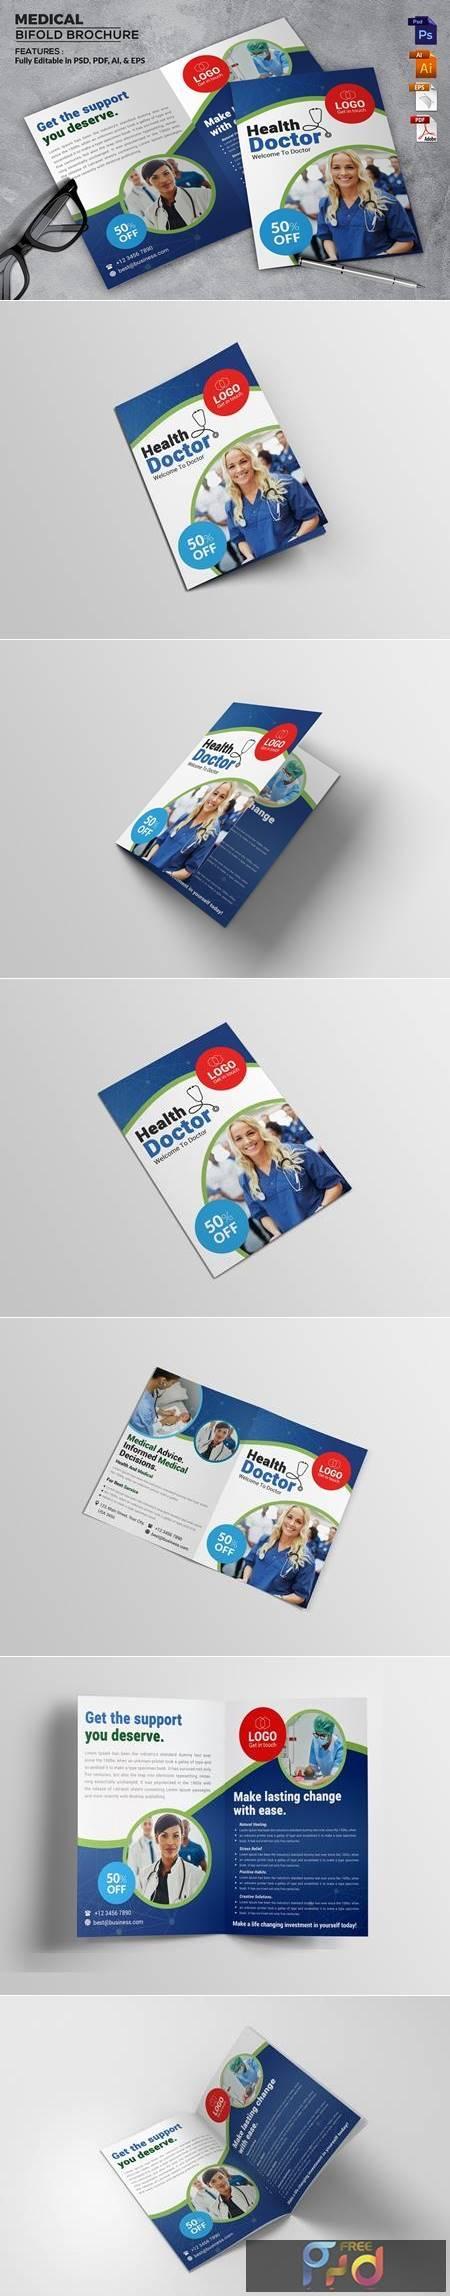 Medical Bifold Brochure 4554212 1